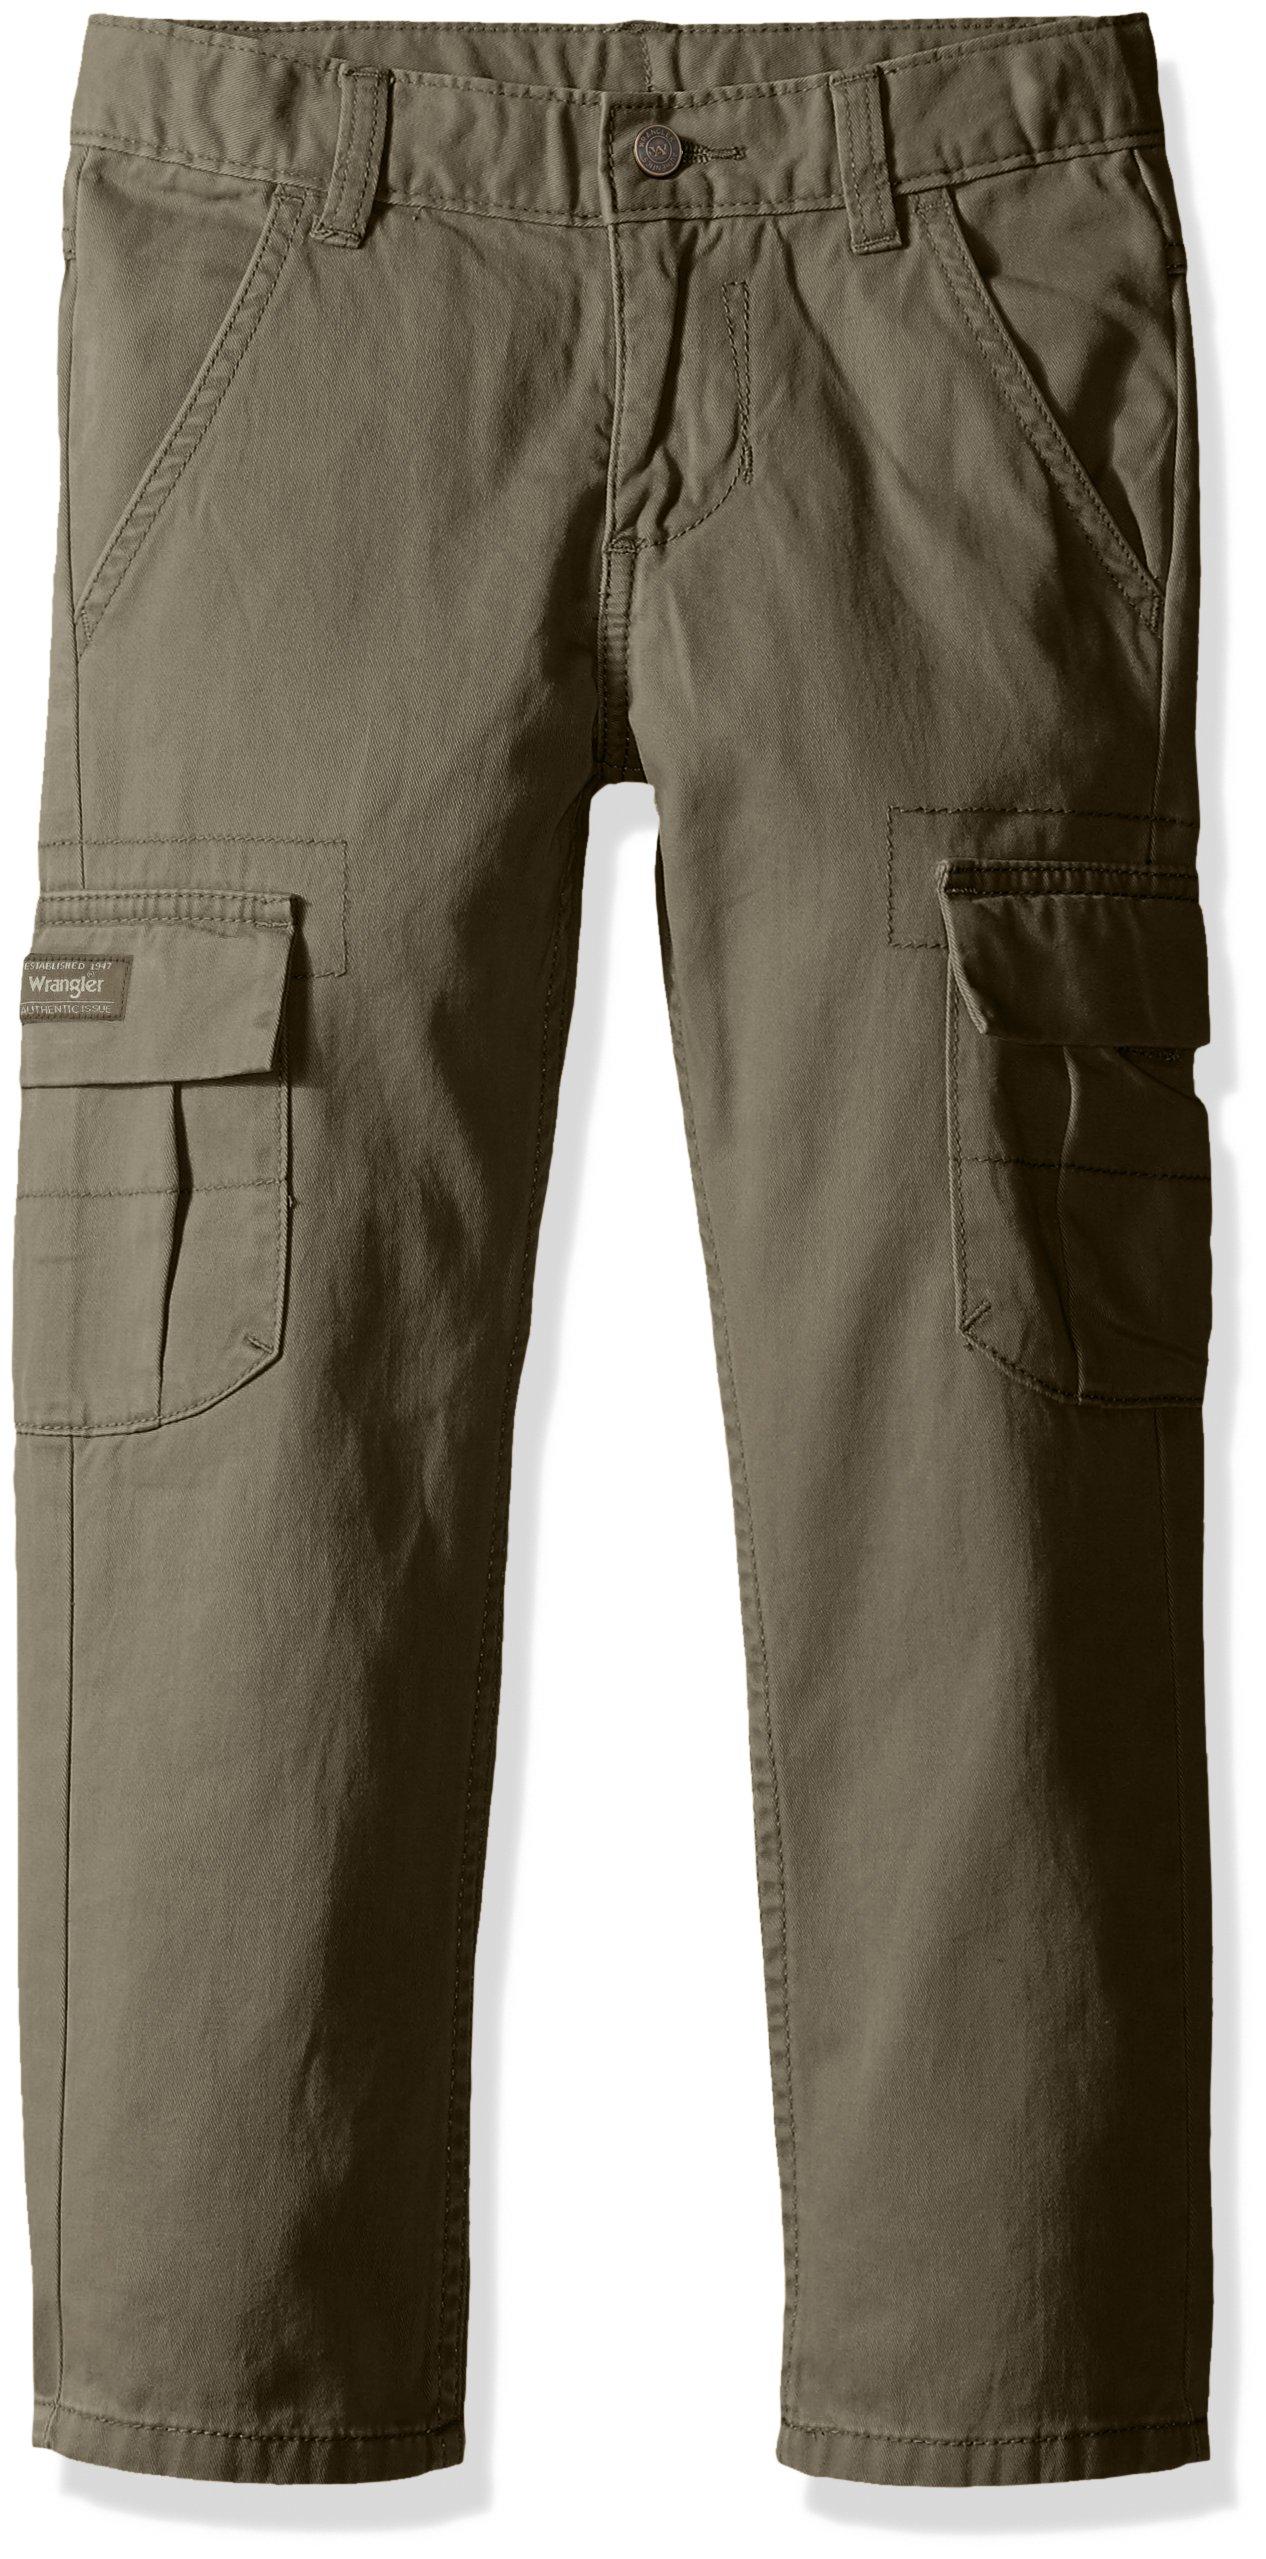 Wrangler Authentics Boys' Classic Cargo Pant, olive, 16 by Wrangler